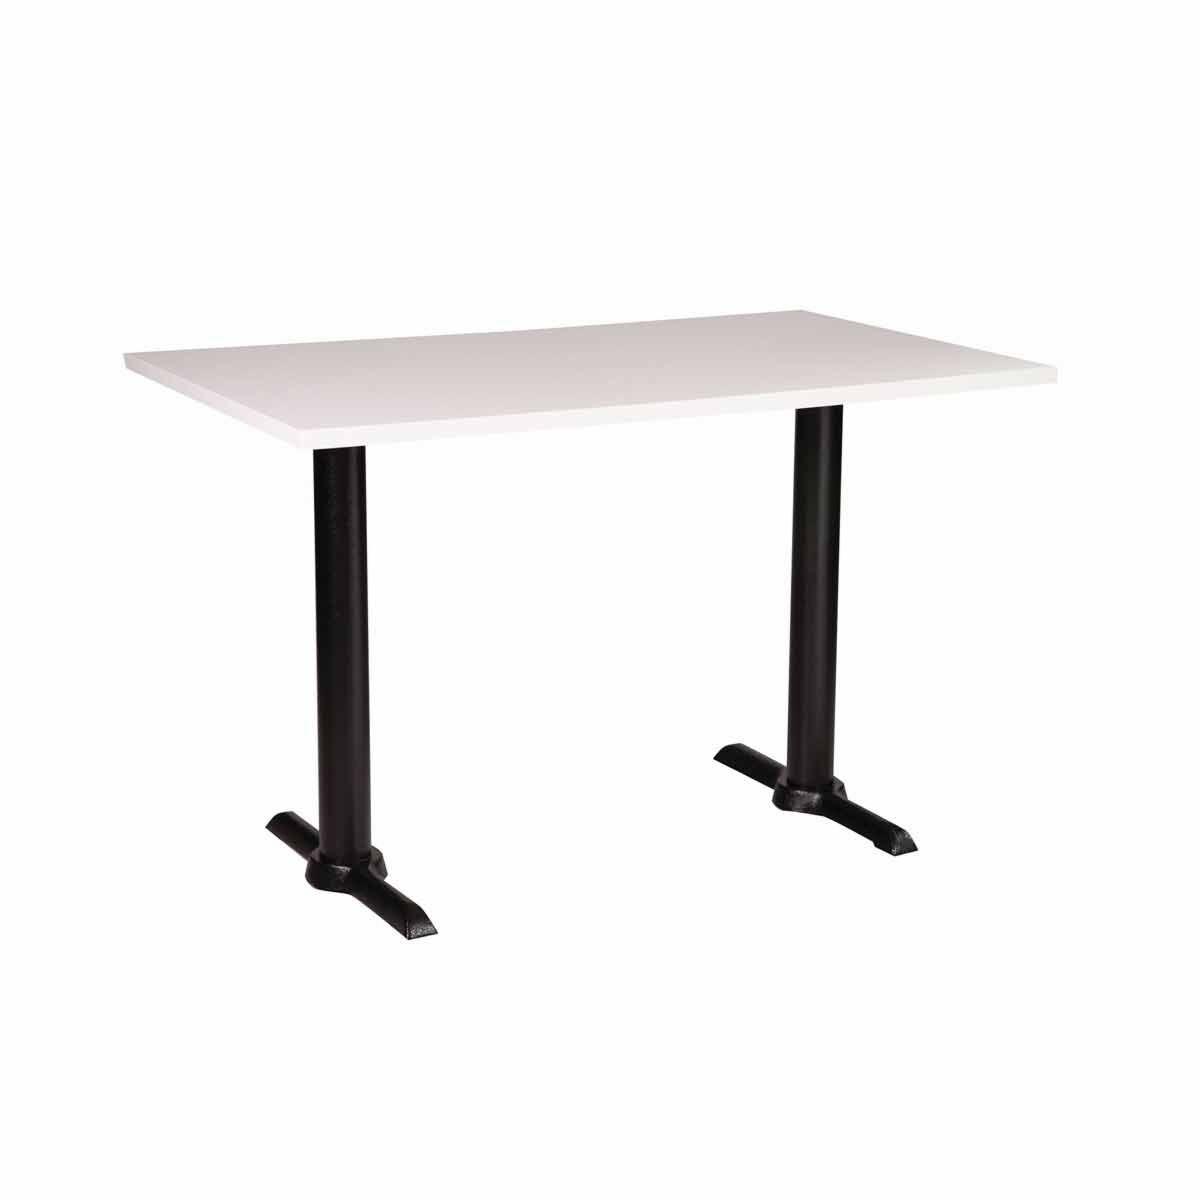 Tabilo Orlando Twin Rectangular Dining Table 1200 x 700mm